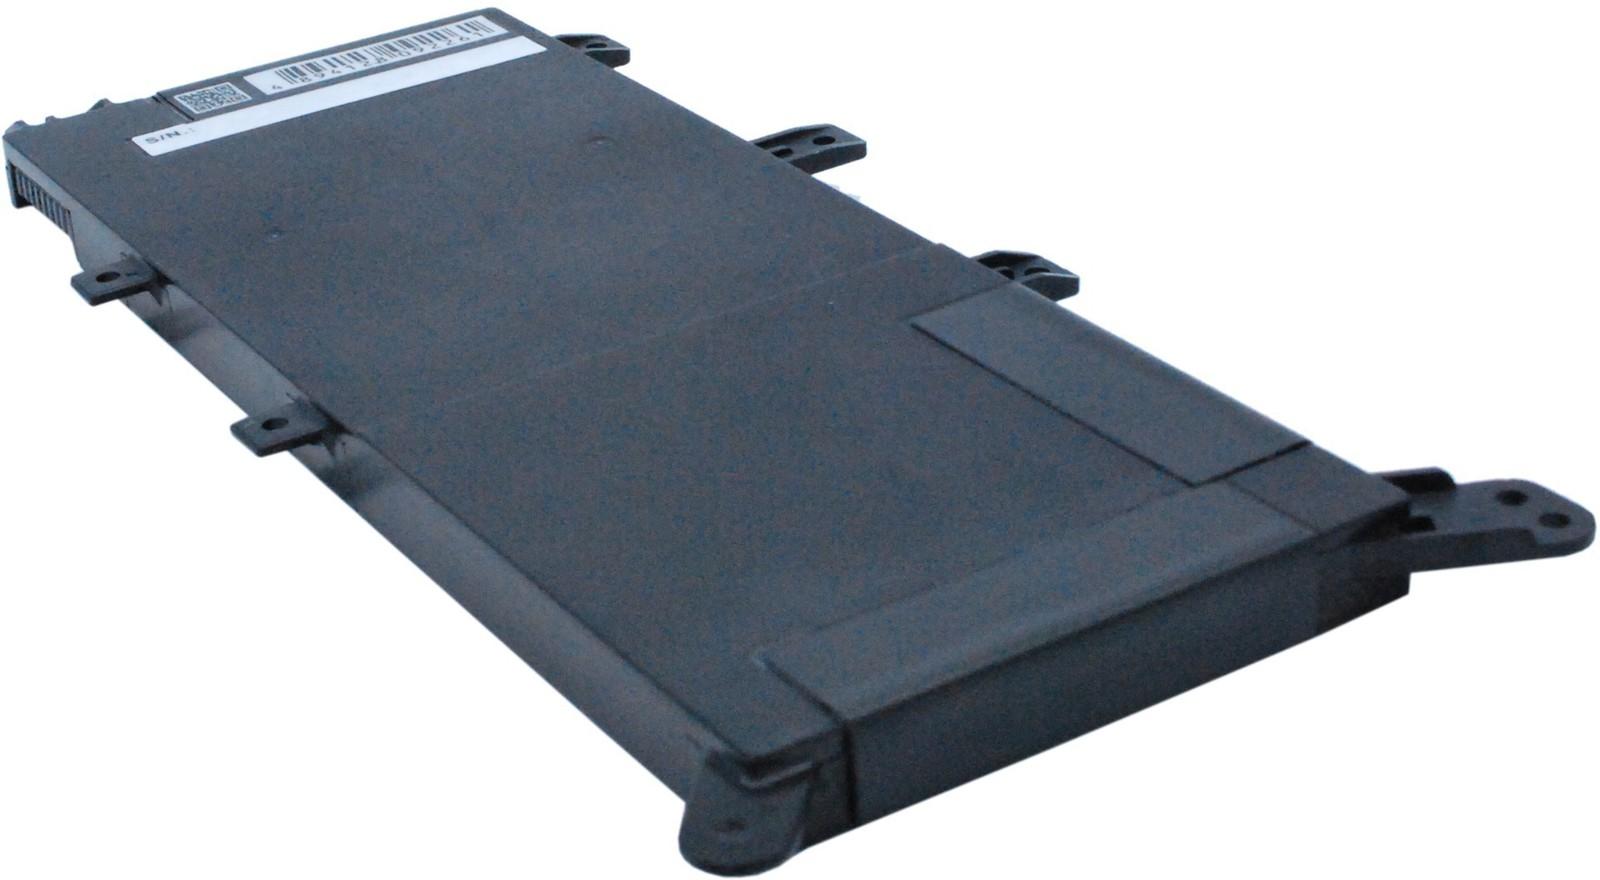 MicroBattery Laptop Battery for Asus 36.48Wh Li-Pol 7.6V 4800mAh MBXAS-BA0135 - eet01